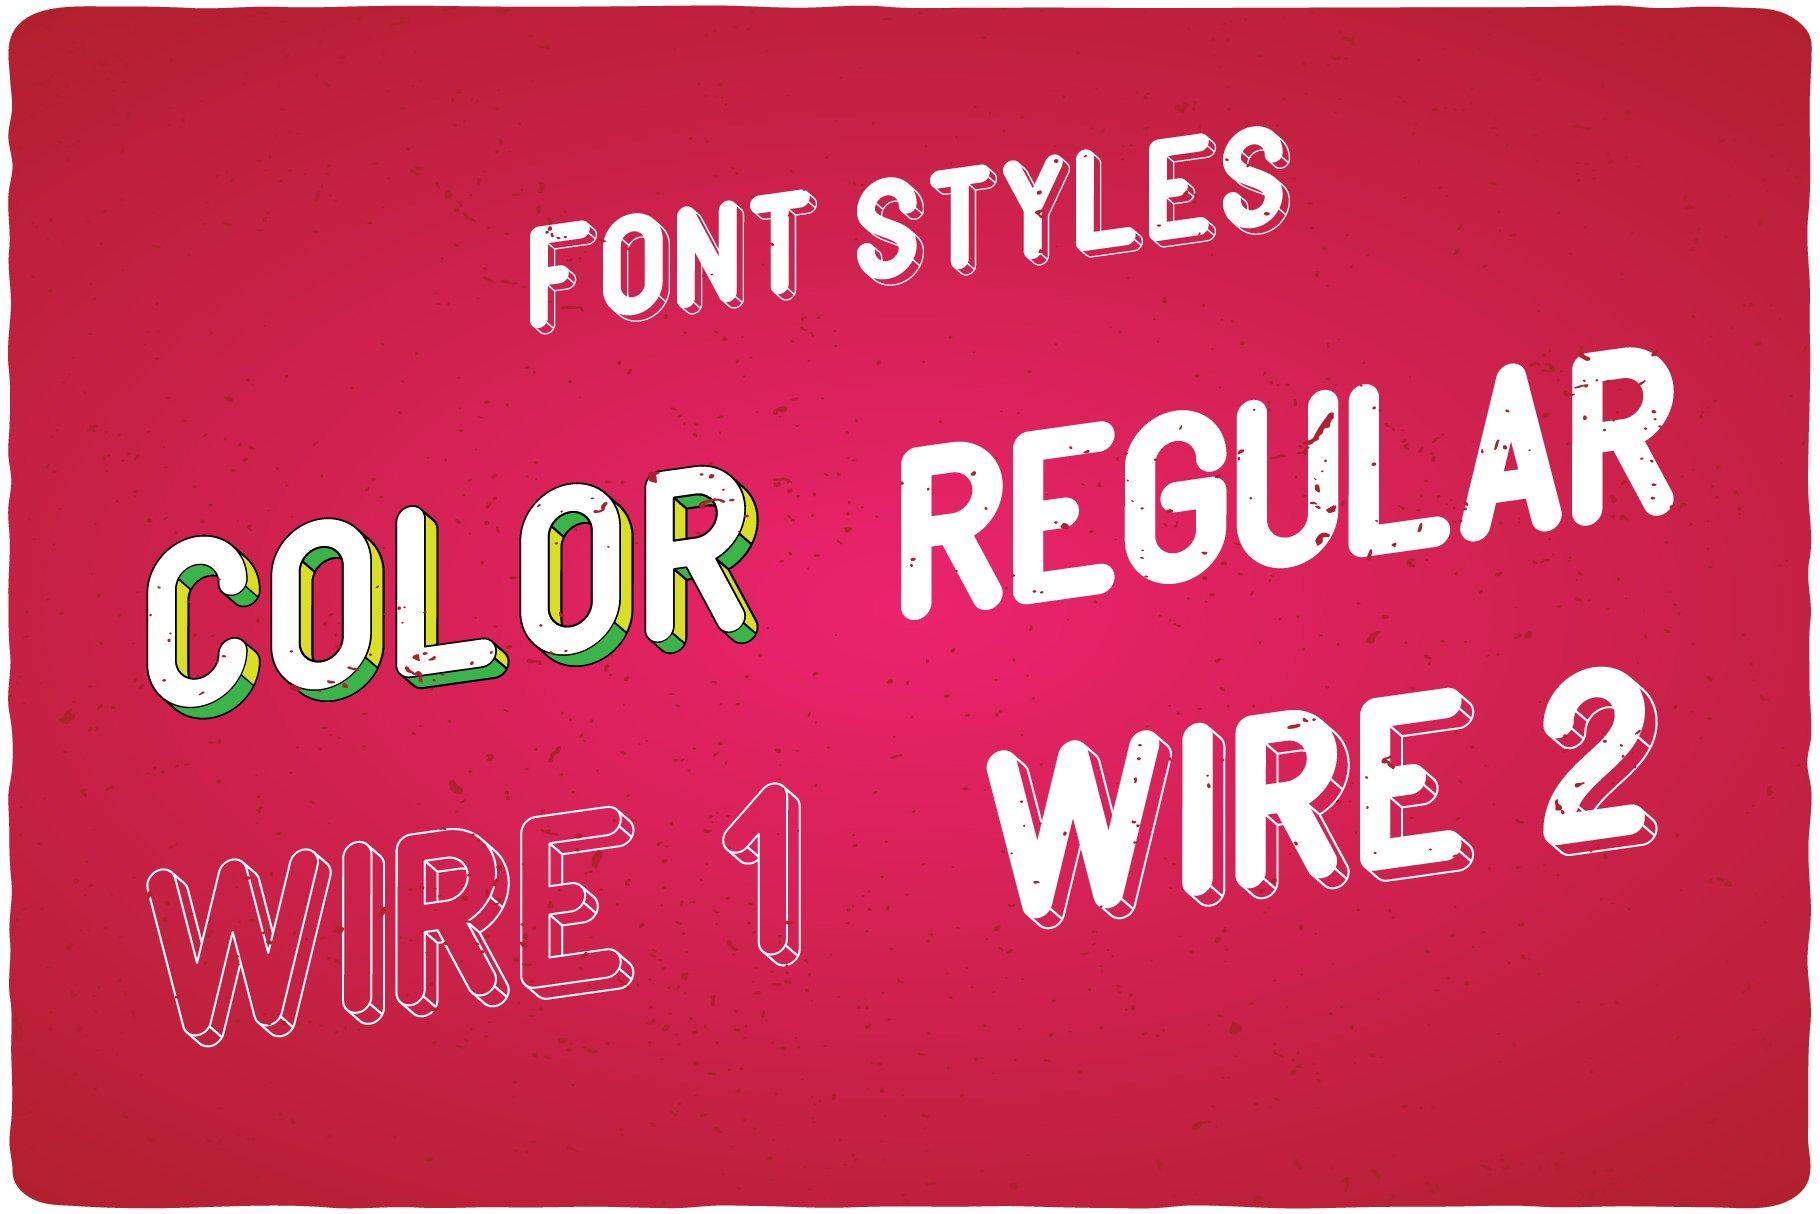 PopArt font styles.